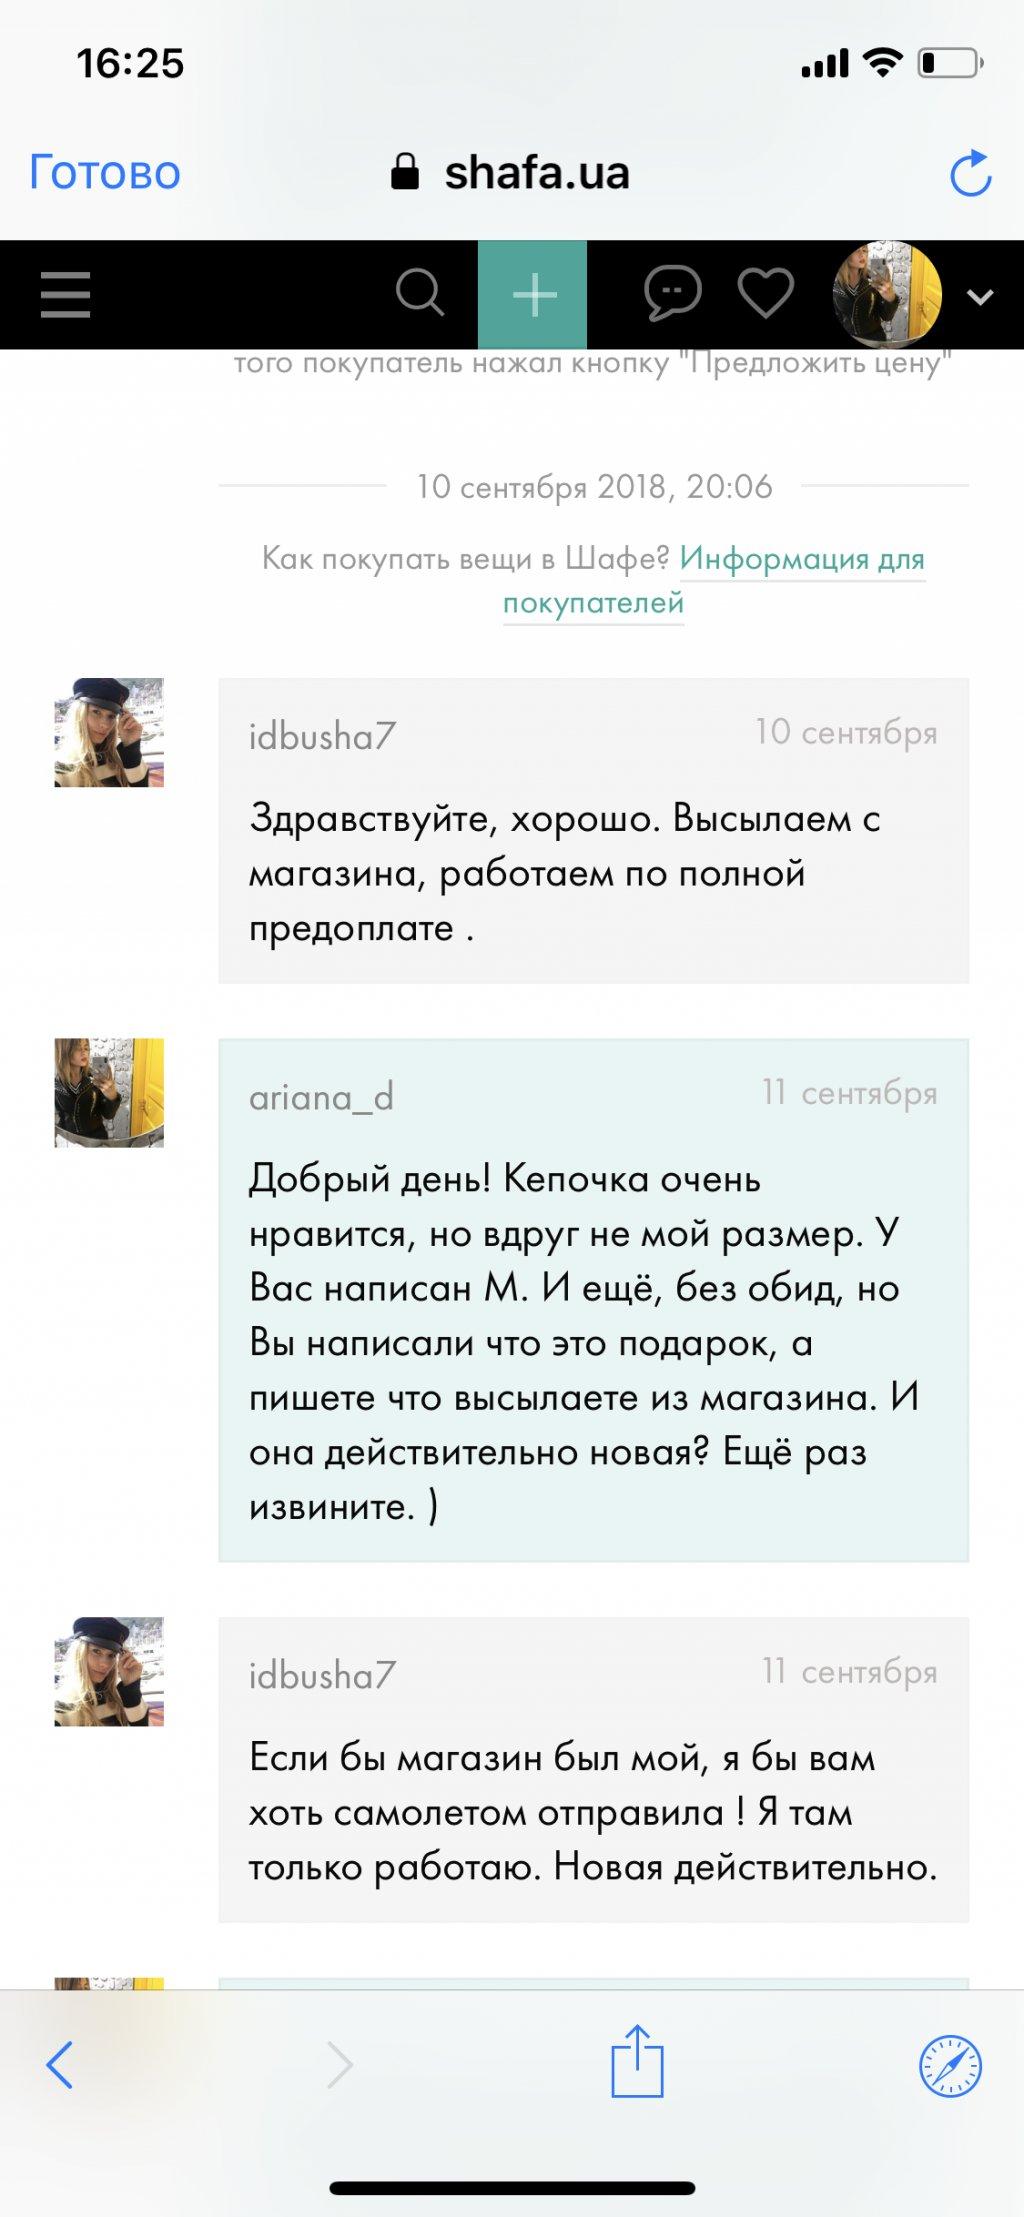 Шафа (shafa.ua) - Осторожно мошенница!! Кинула на 2000 грн.